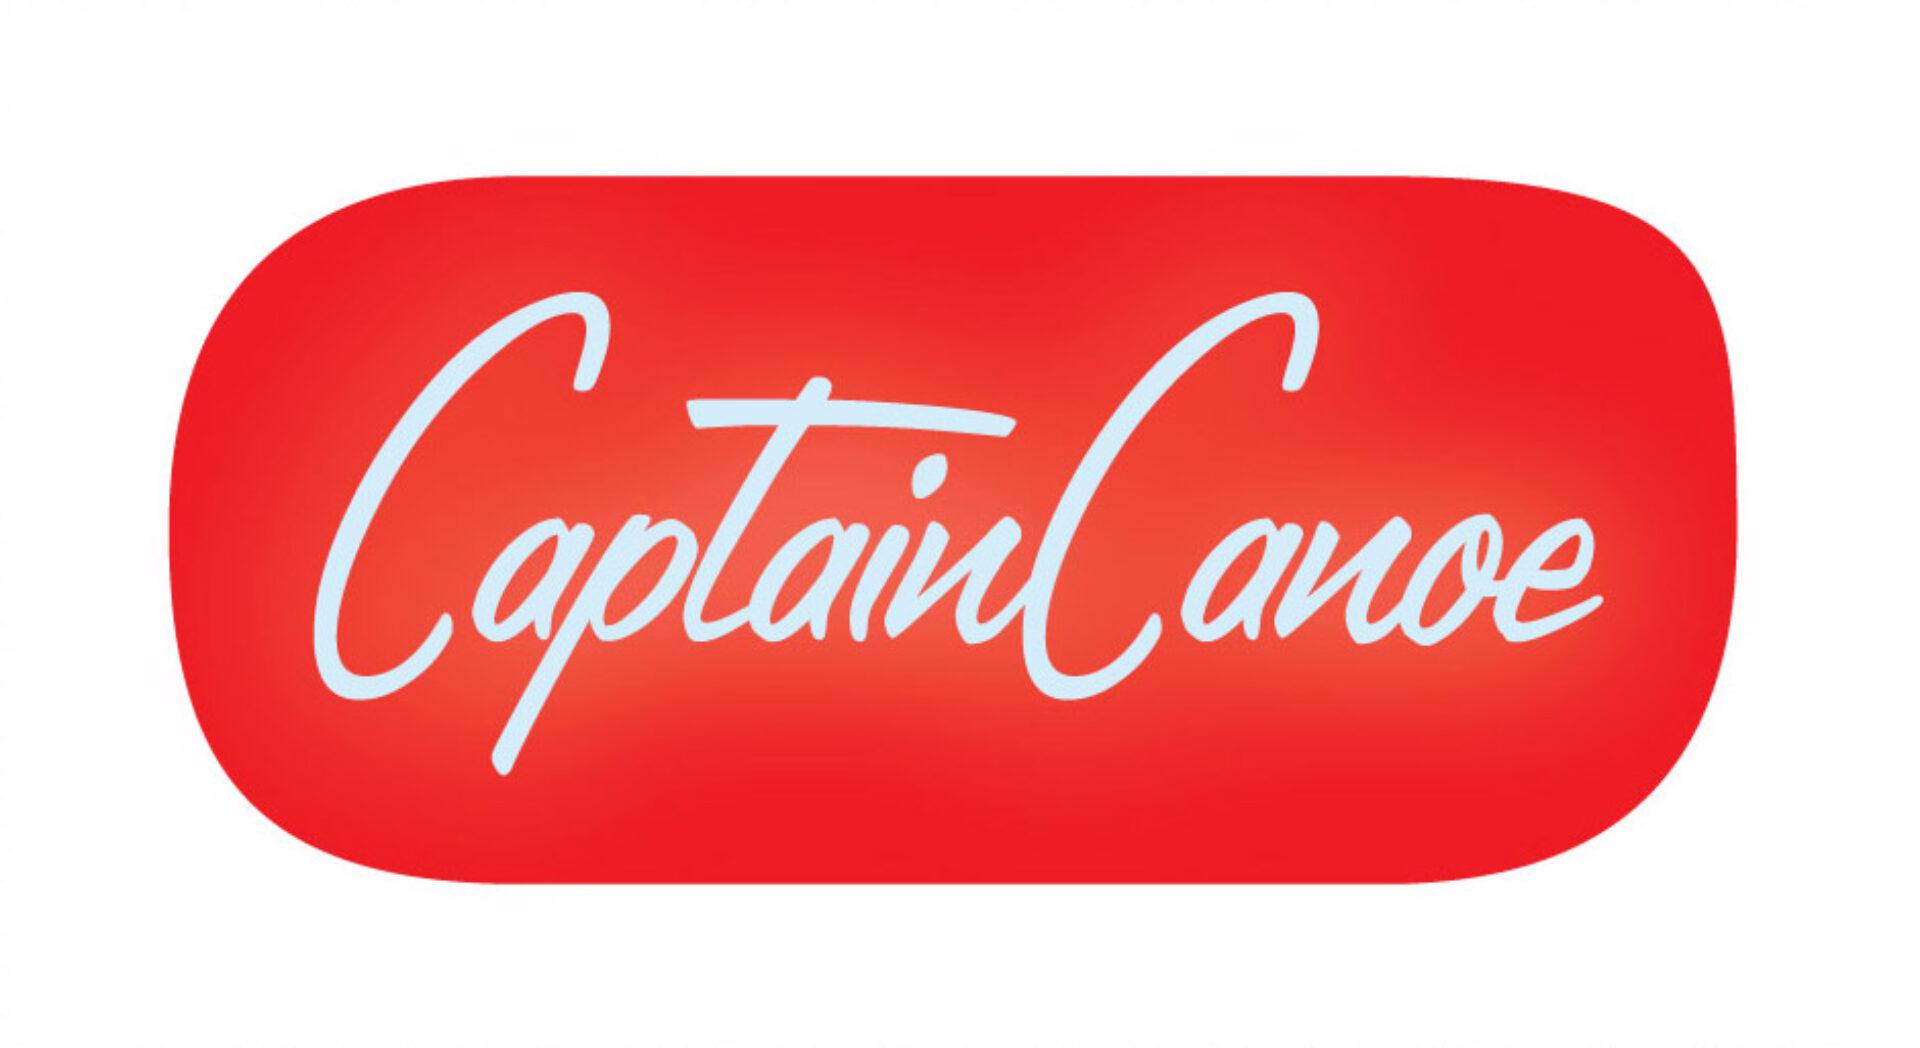 Captain canoe 01